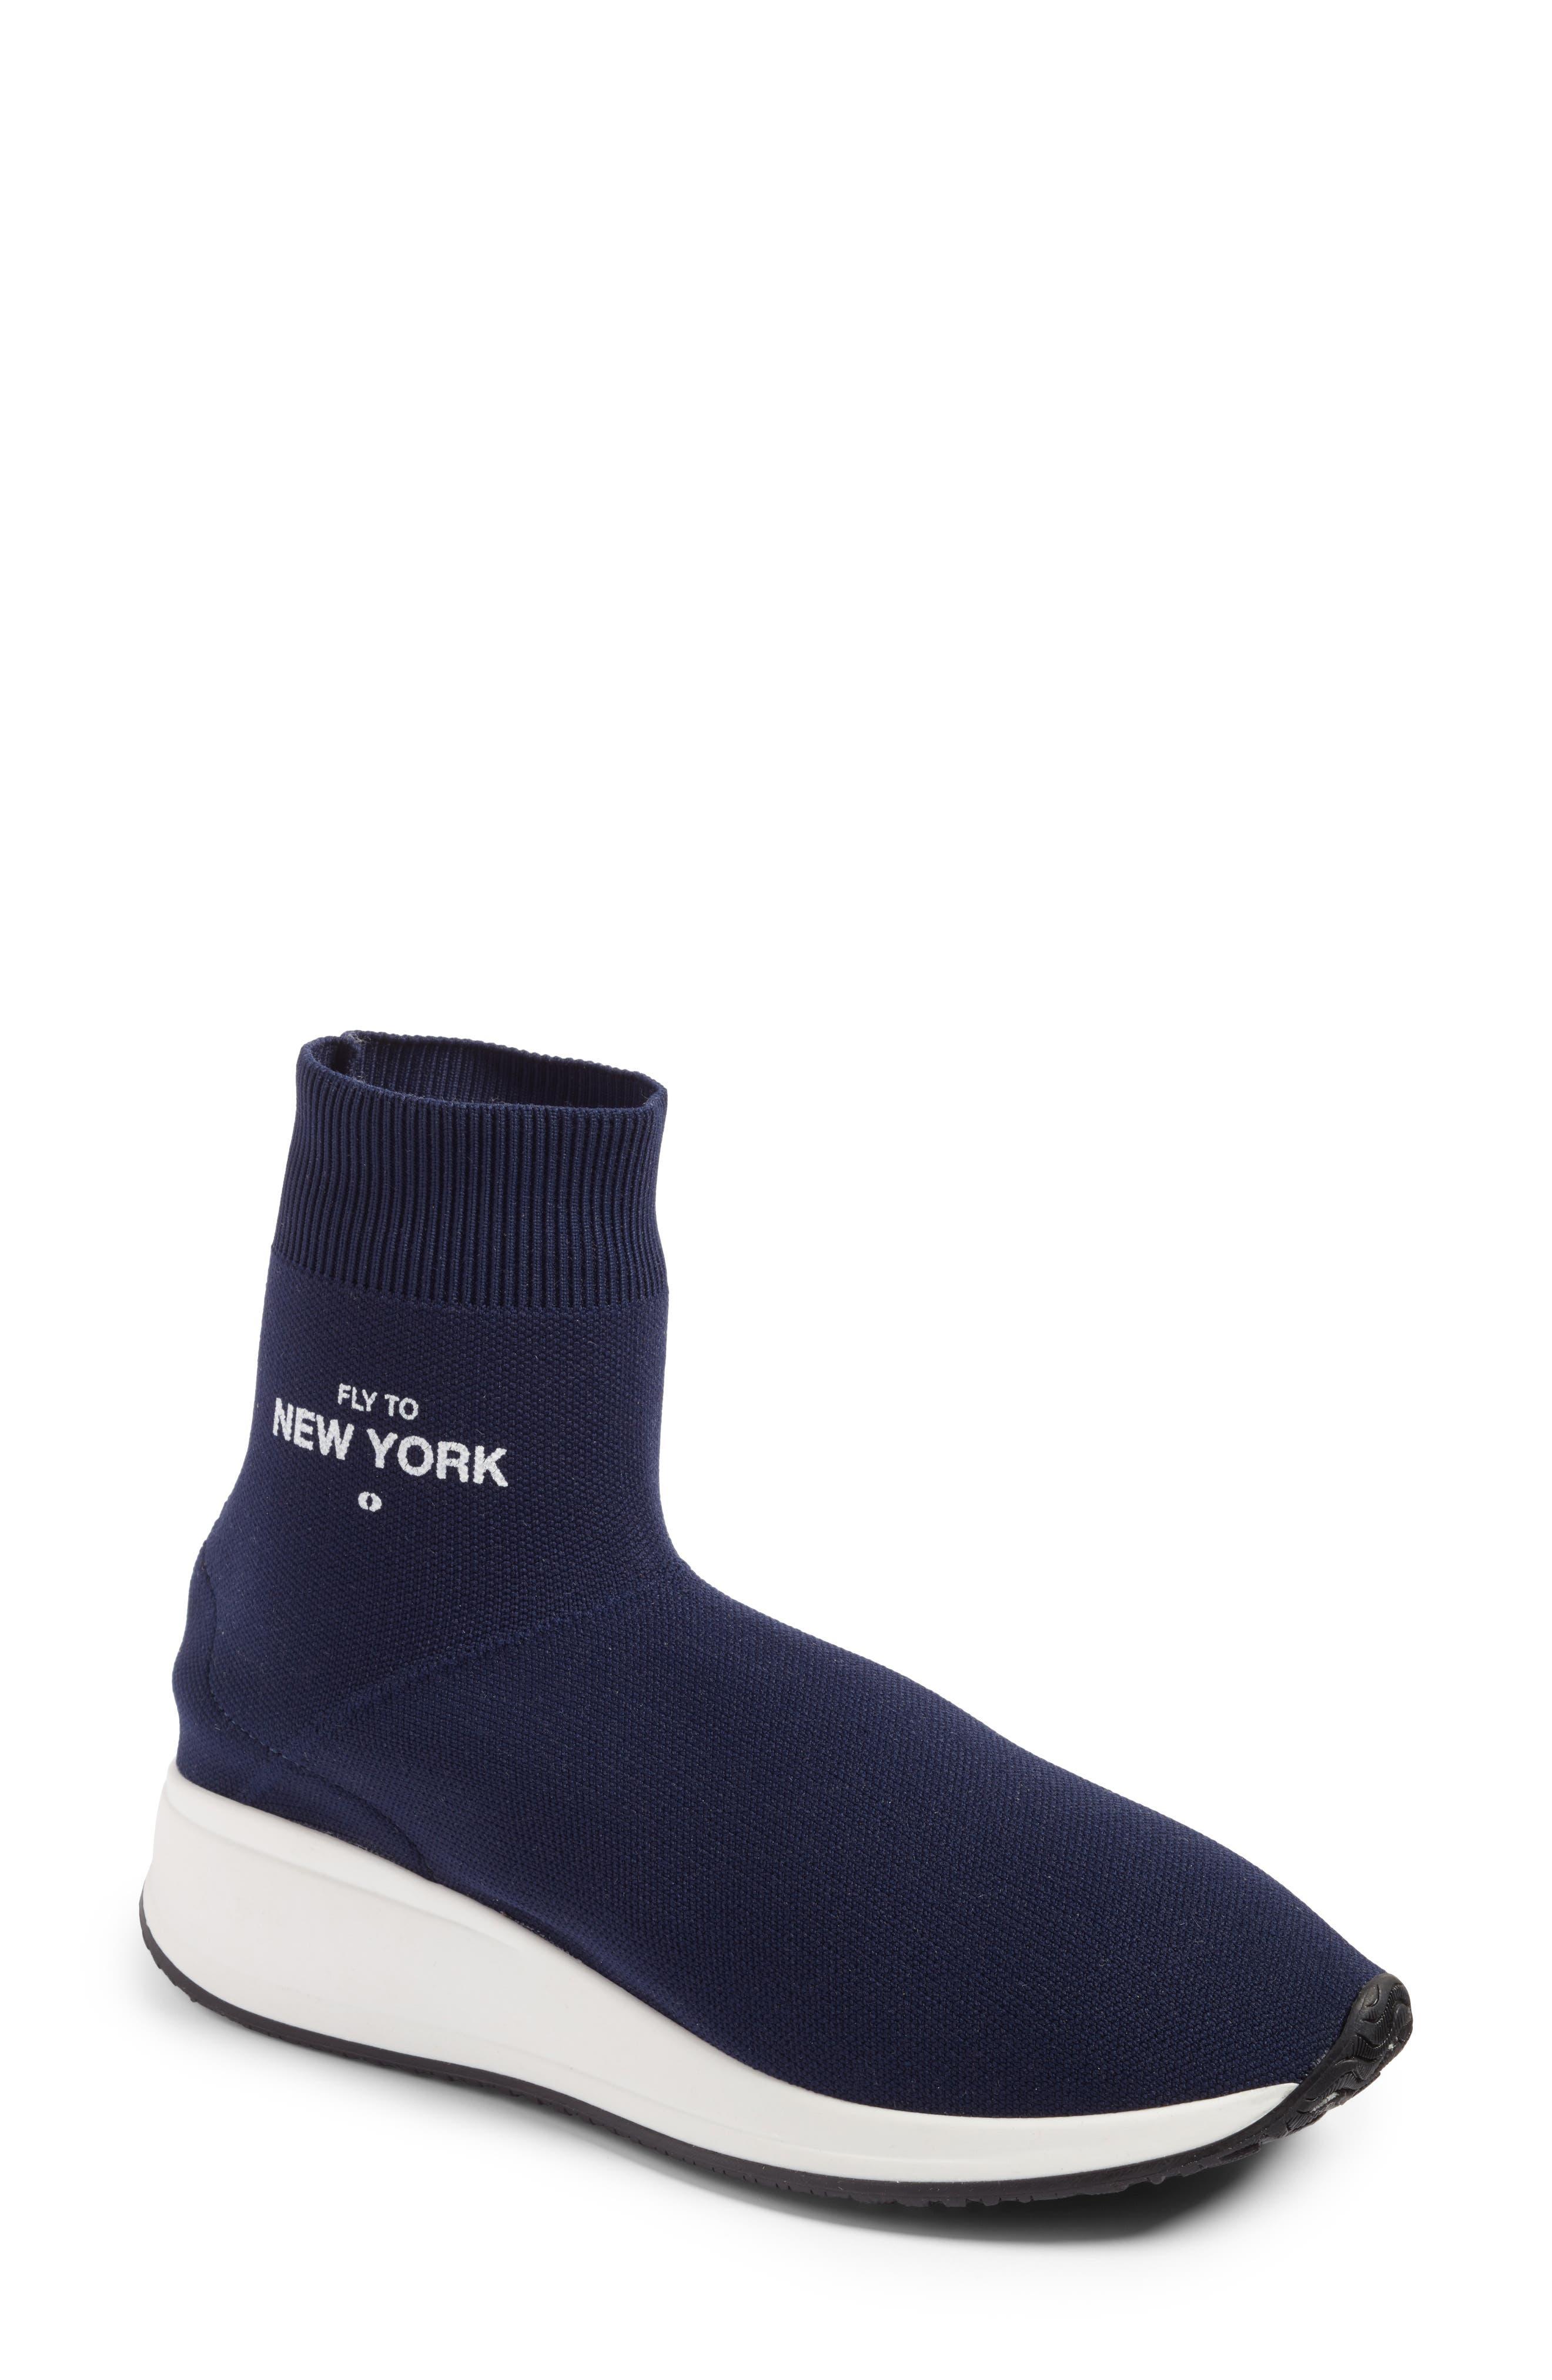 JOSHUA SANDERS Fly To High Top Sock Sneaker (Women)